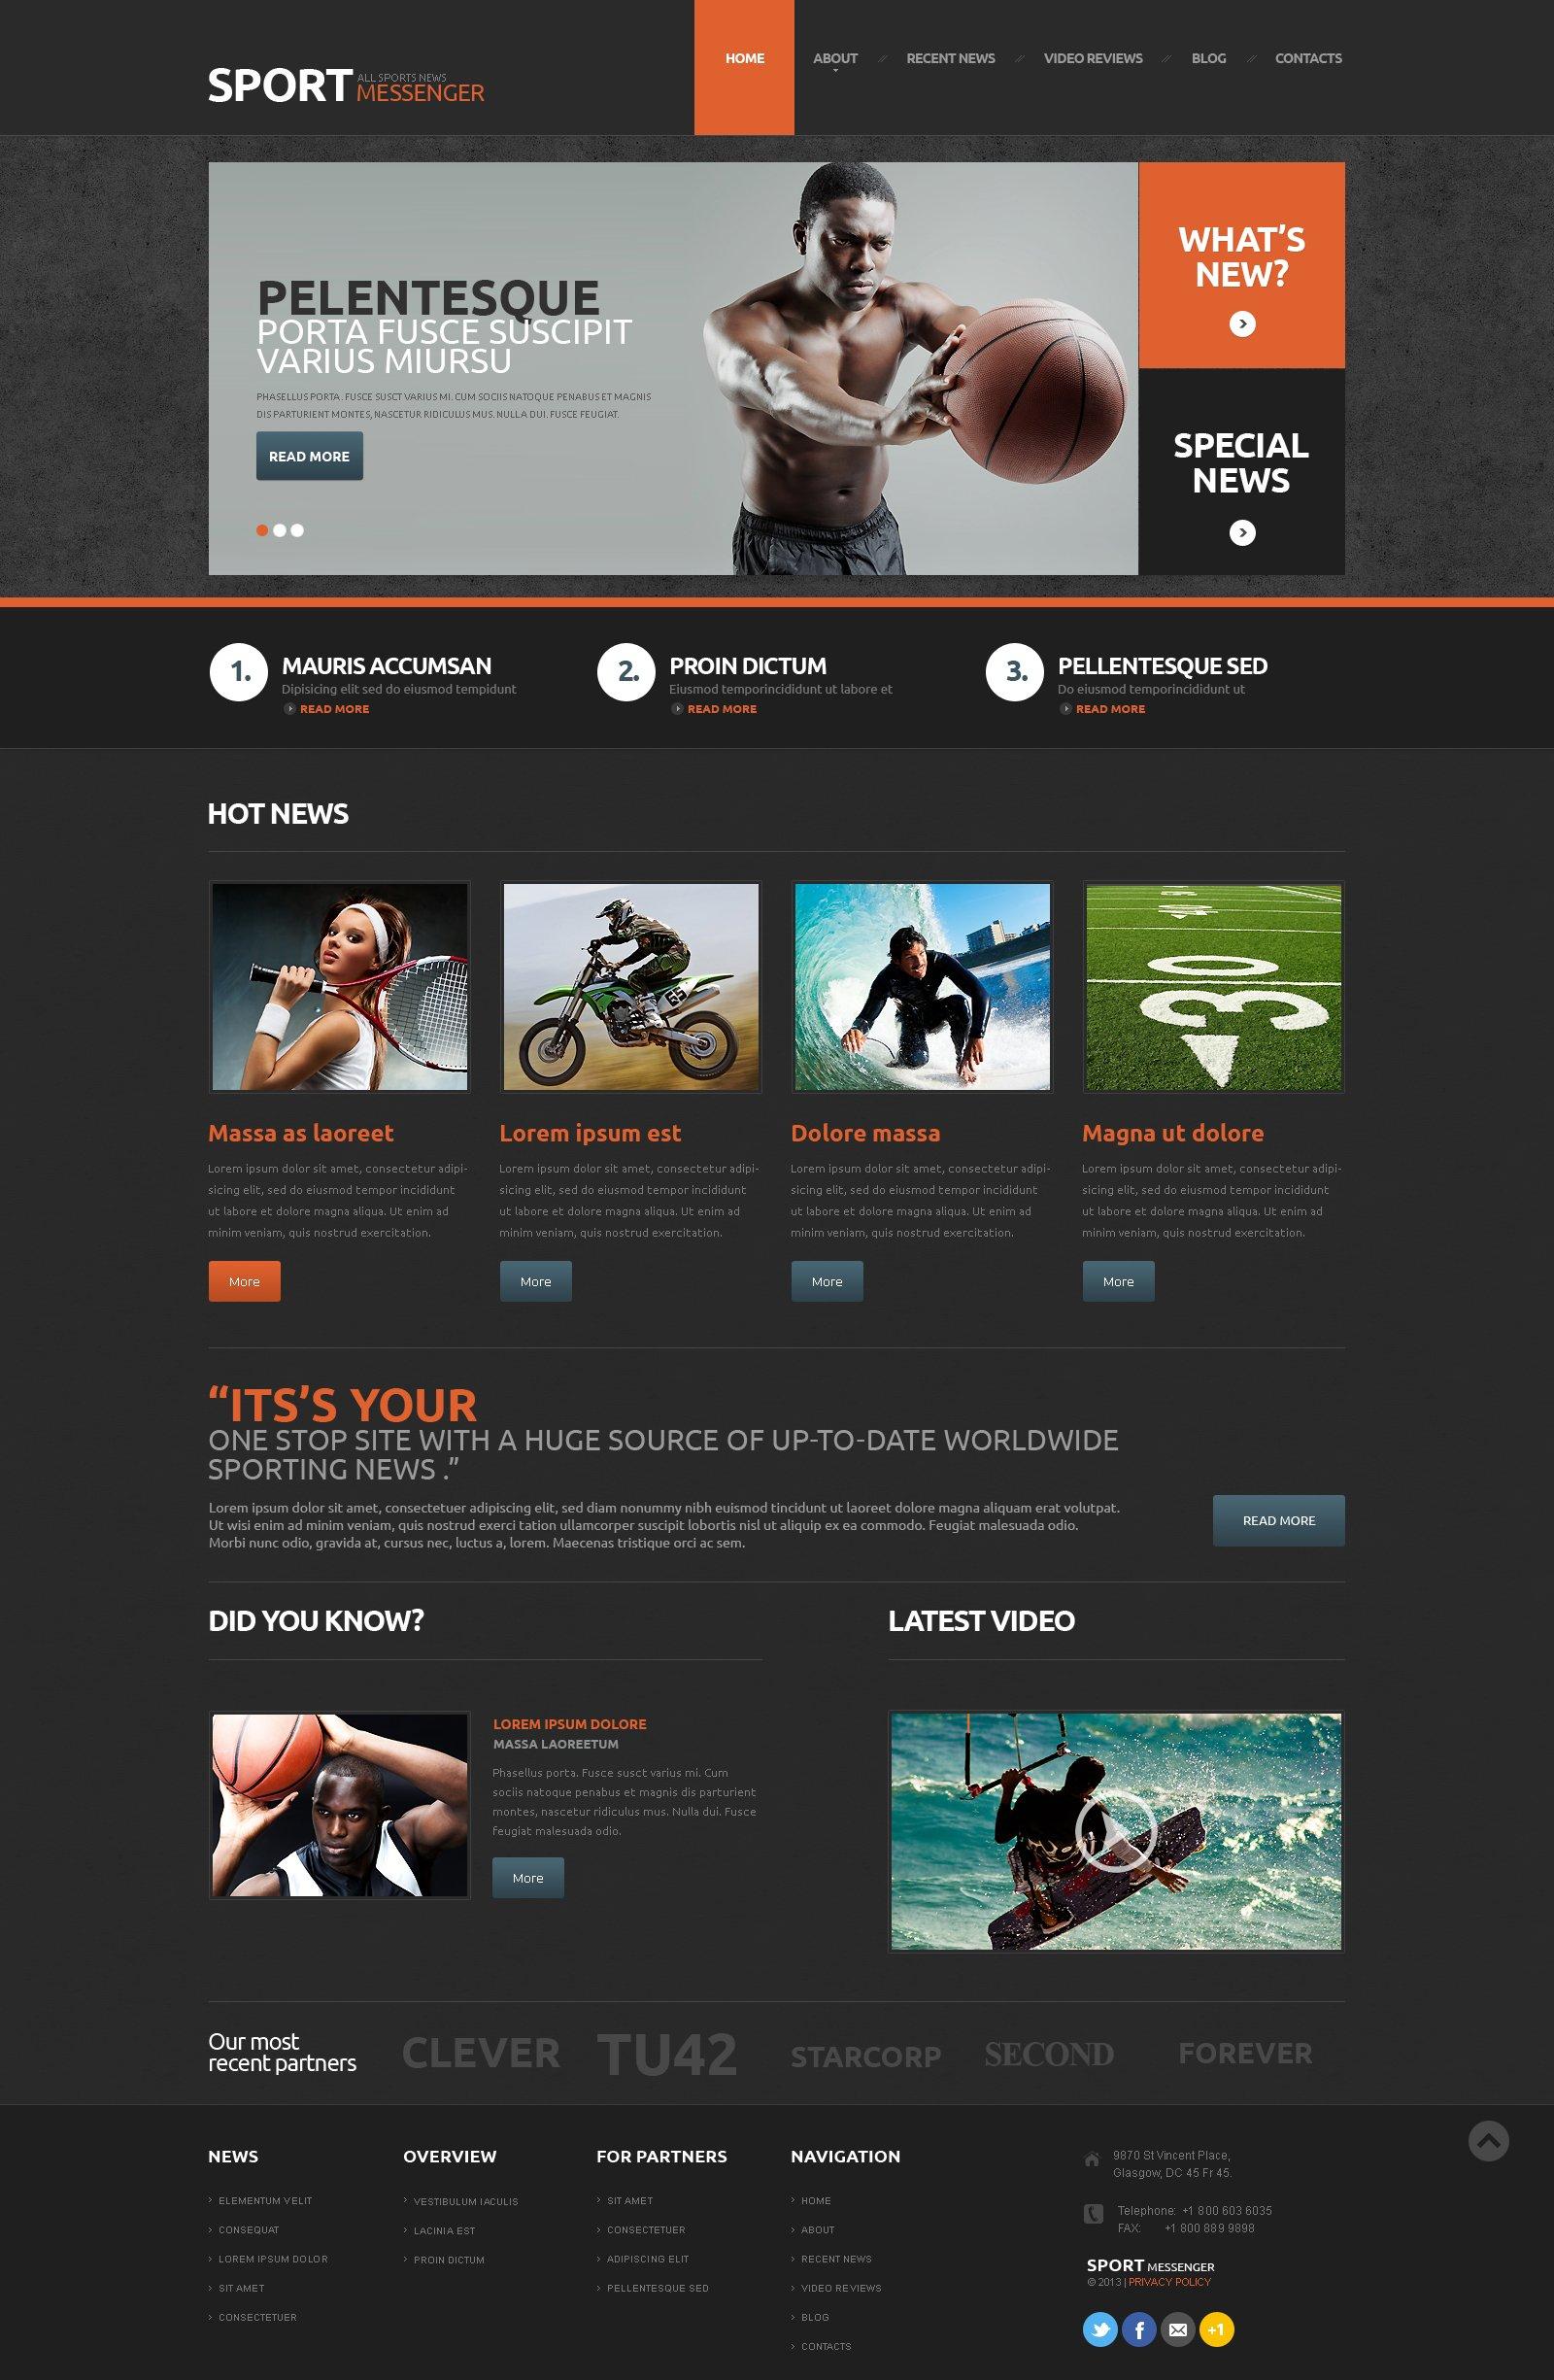 Reszponzív Sport hír WordPress sablon 48602